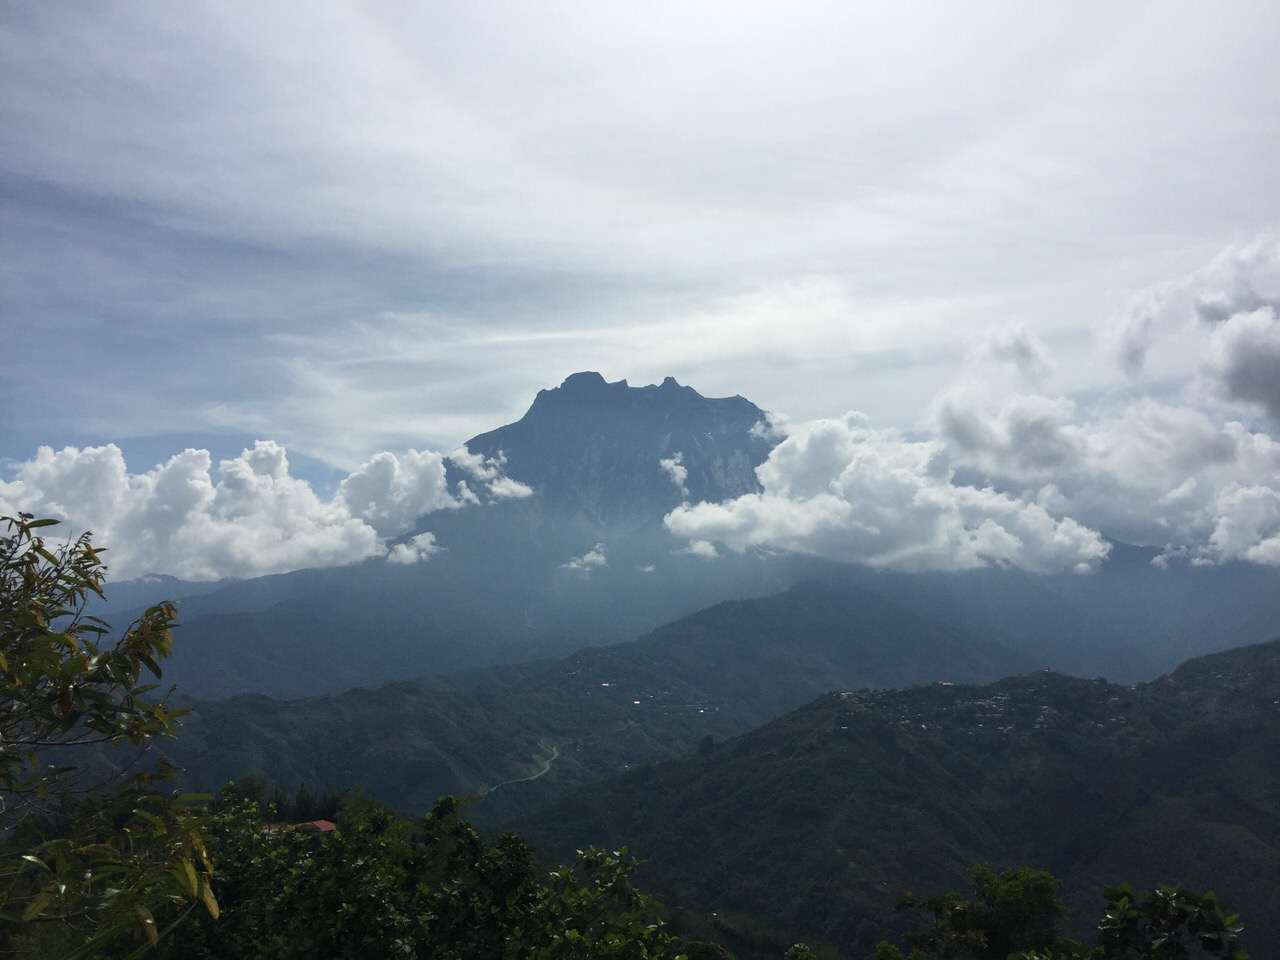 Kota Kinabalu climbing 3960